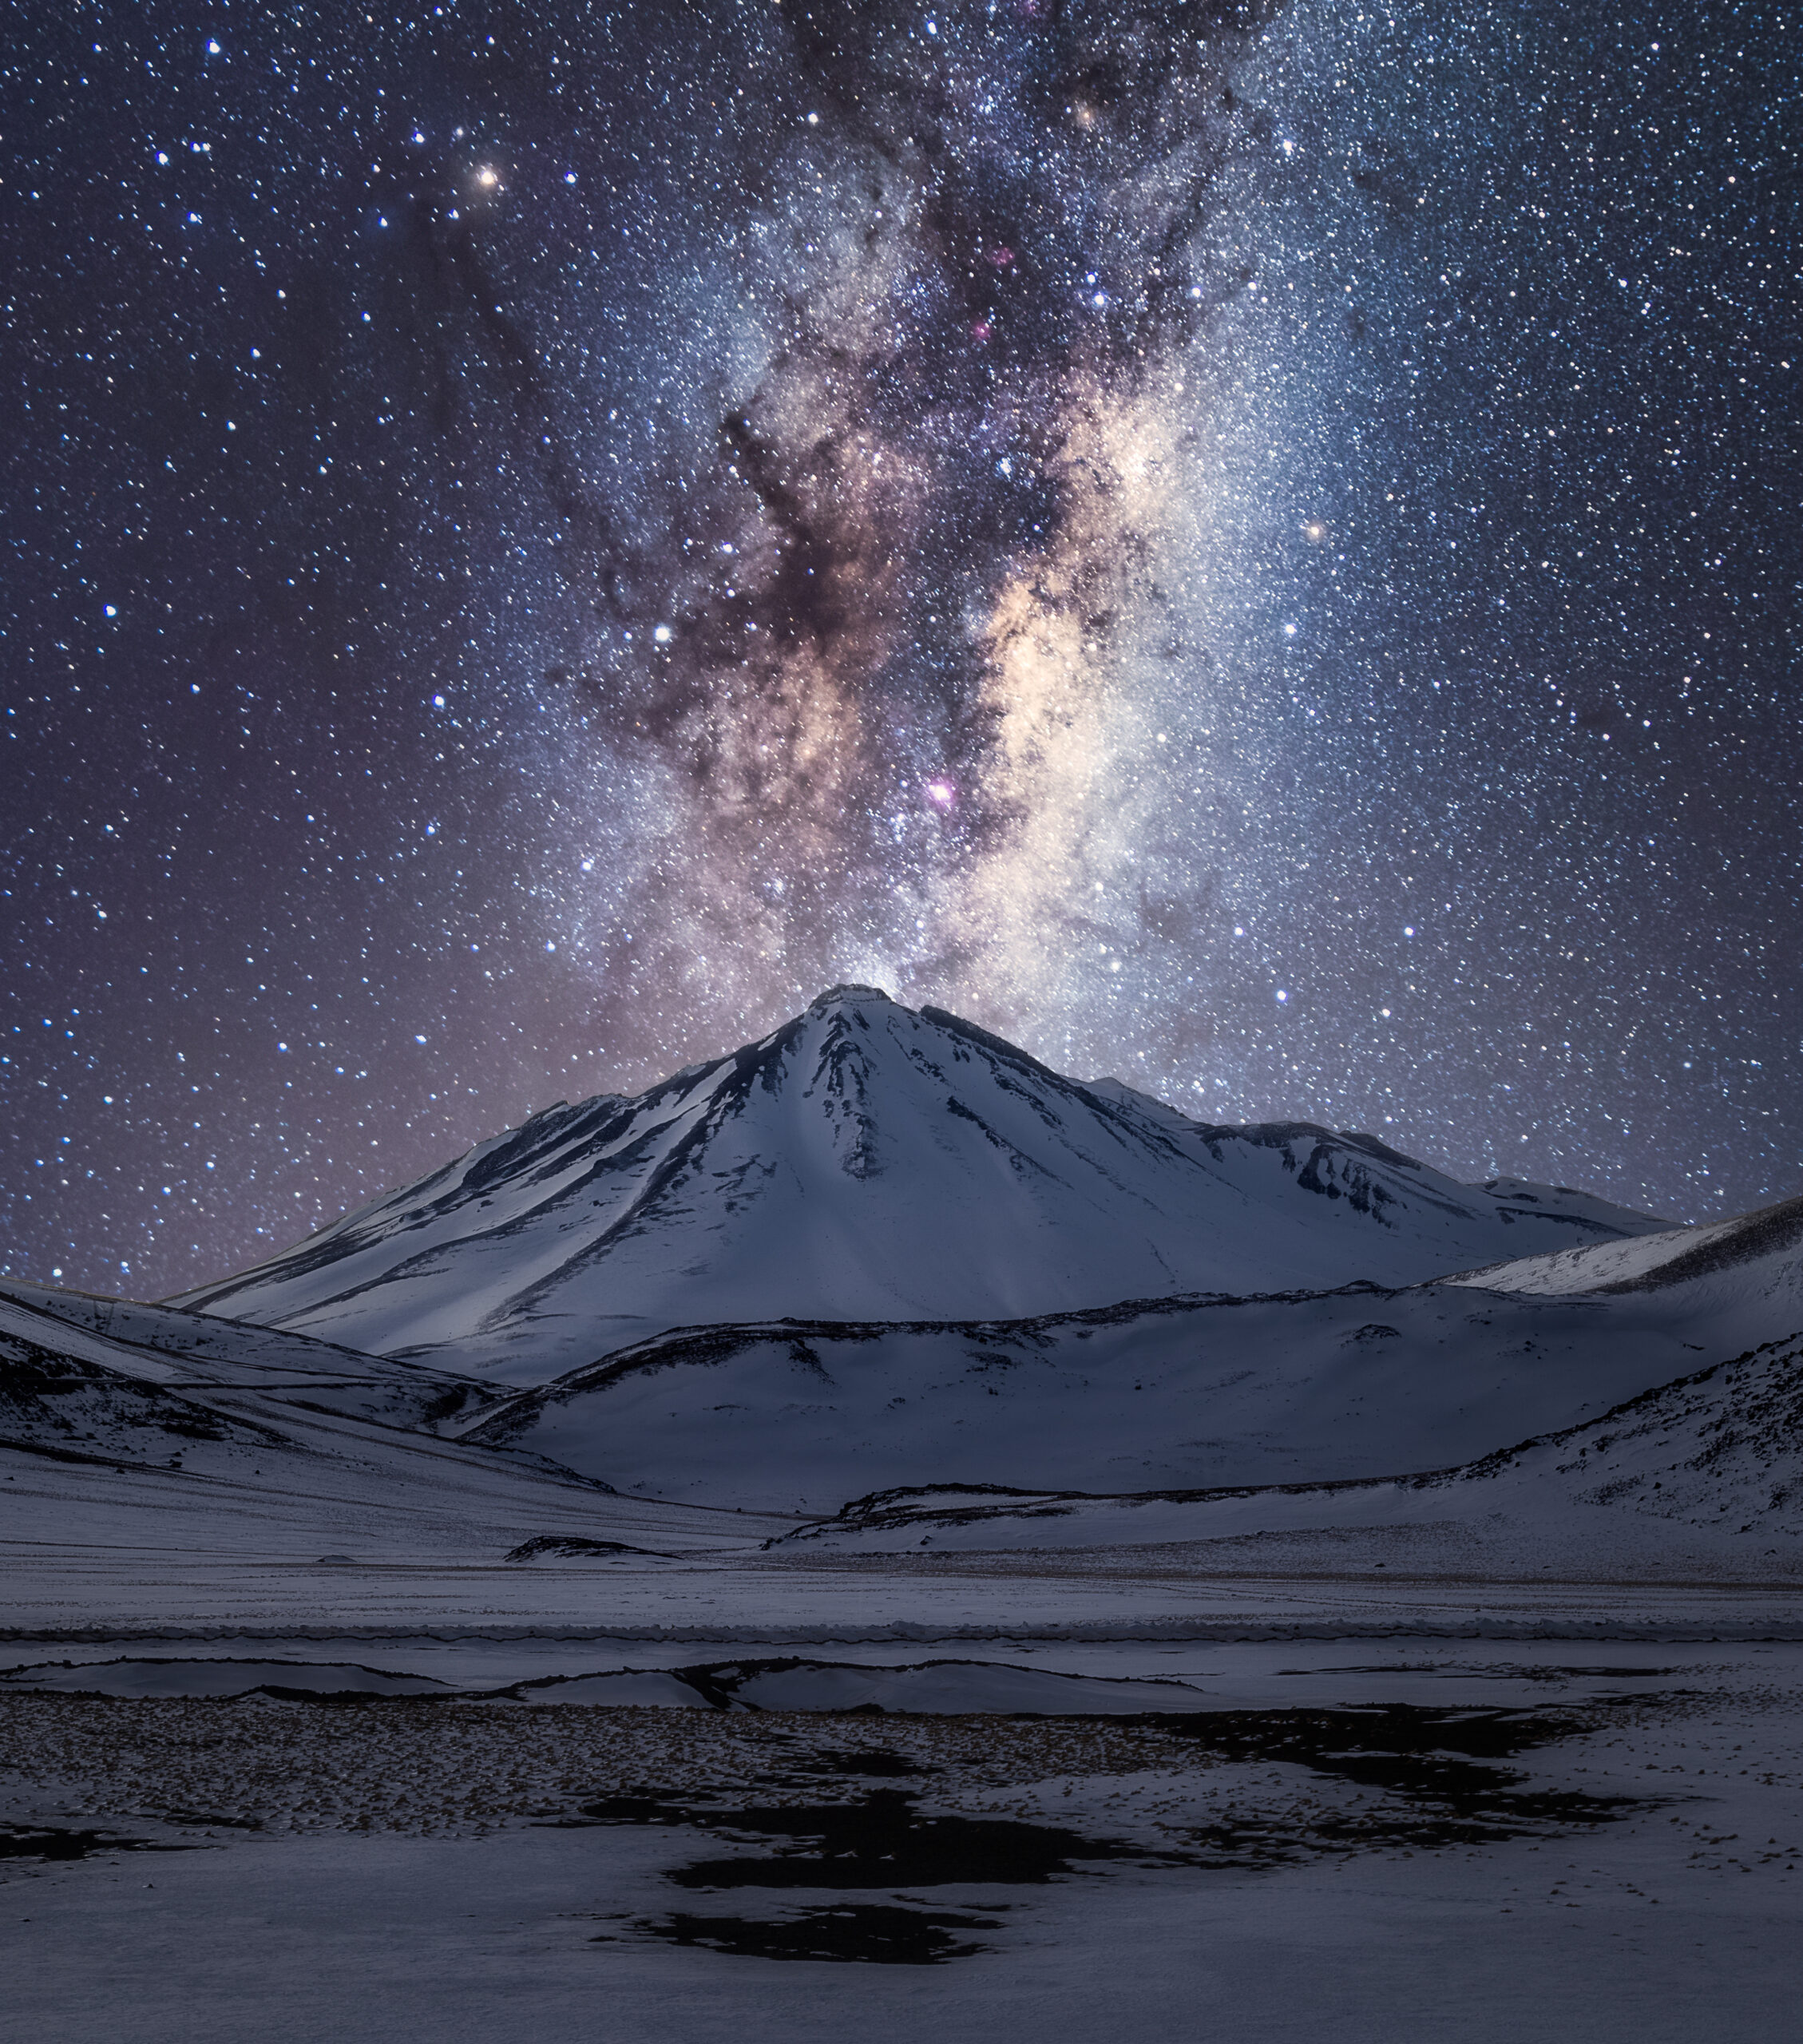 Stars strewn across a striking and dark landscape.